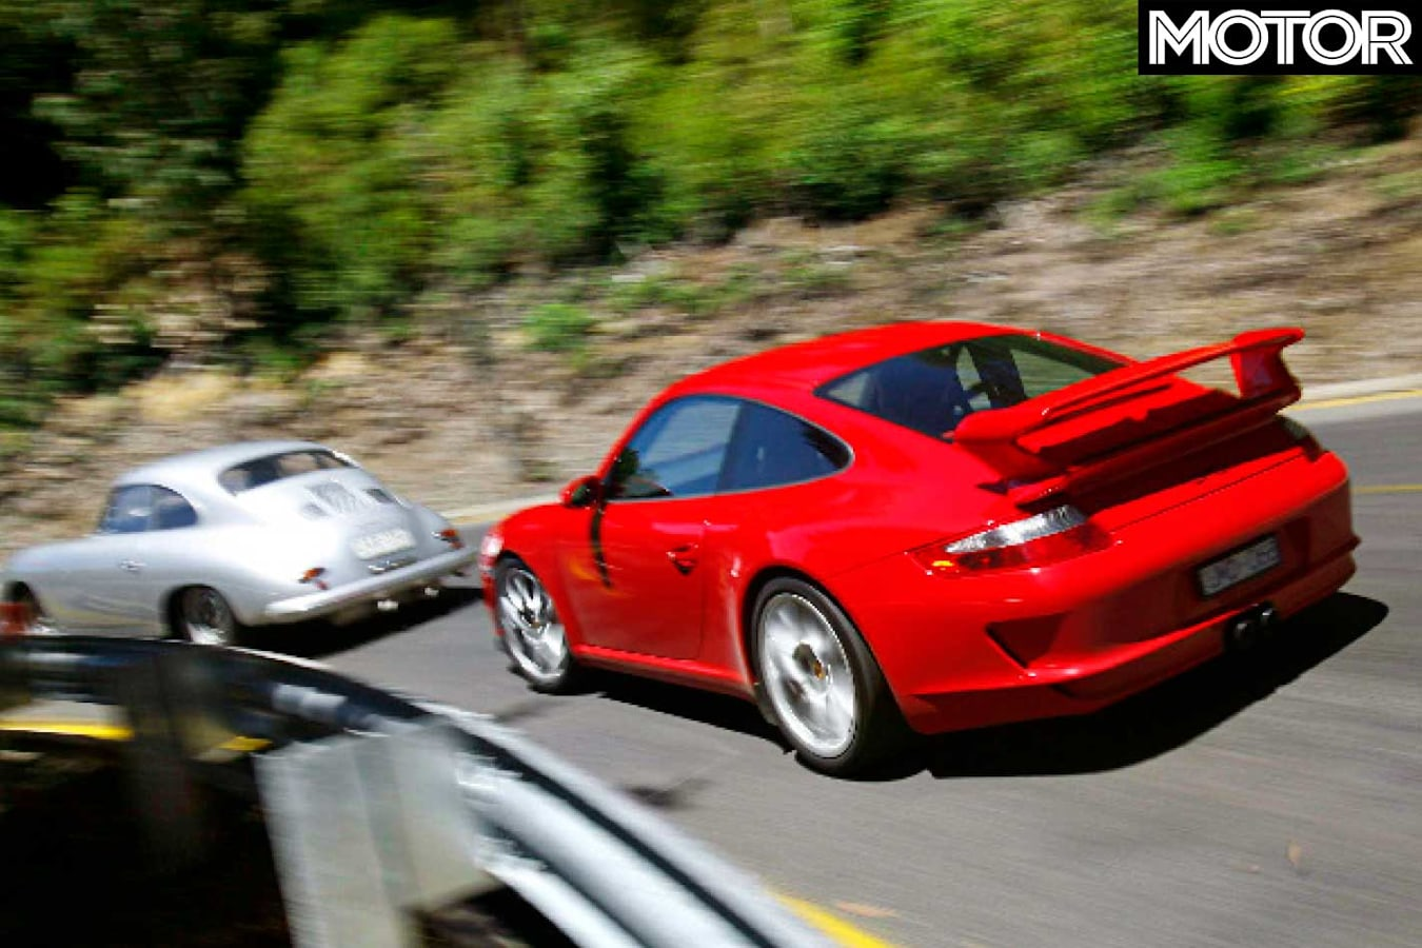 2007 Porsche 911 GT 3 Vs 1957 Porsche 356 Carrera GT Drive Comparison Jpg